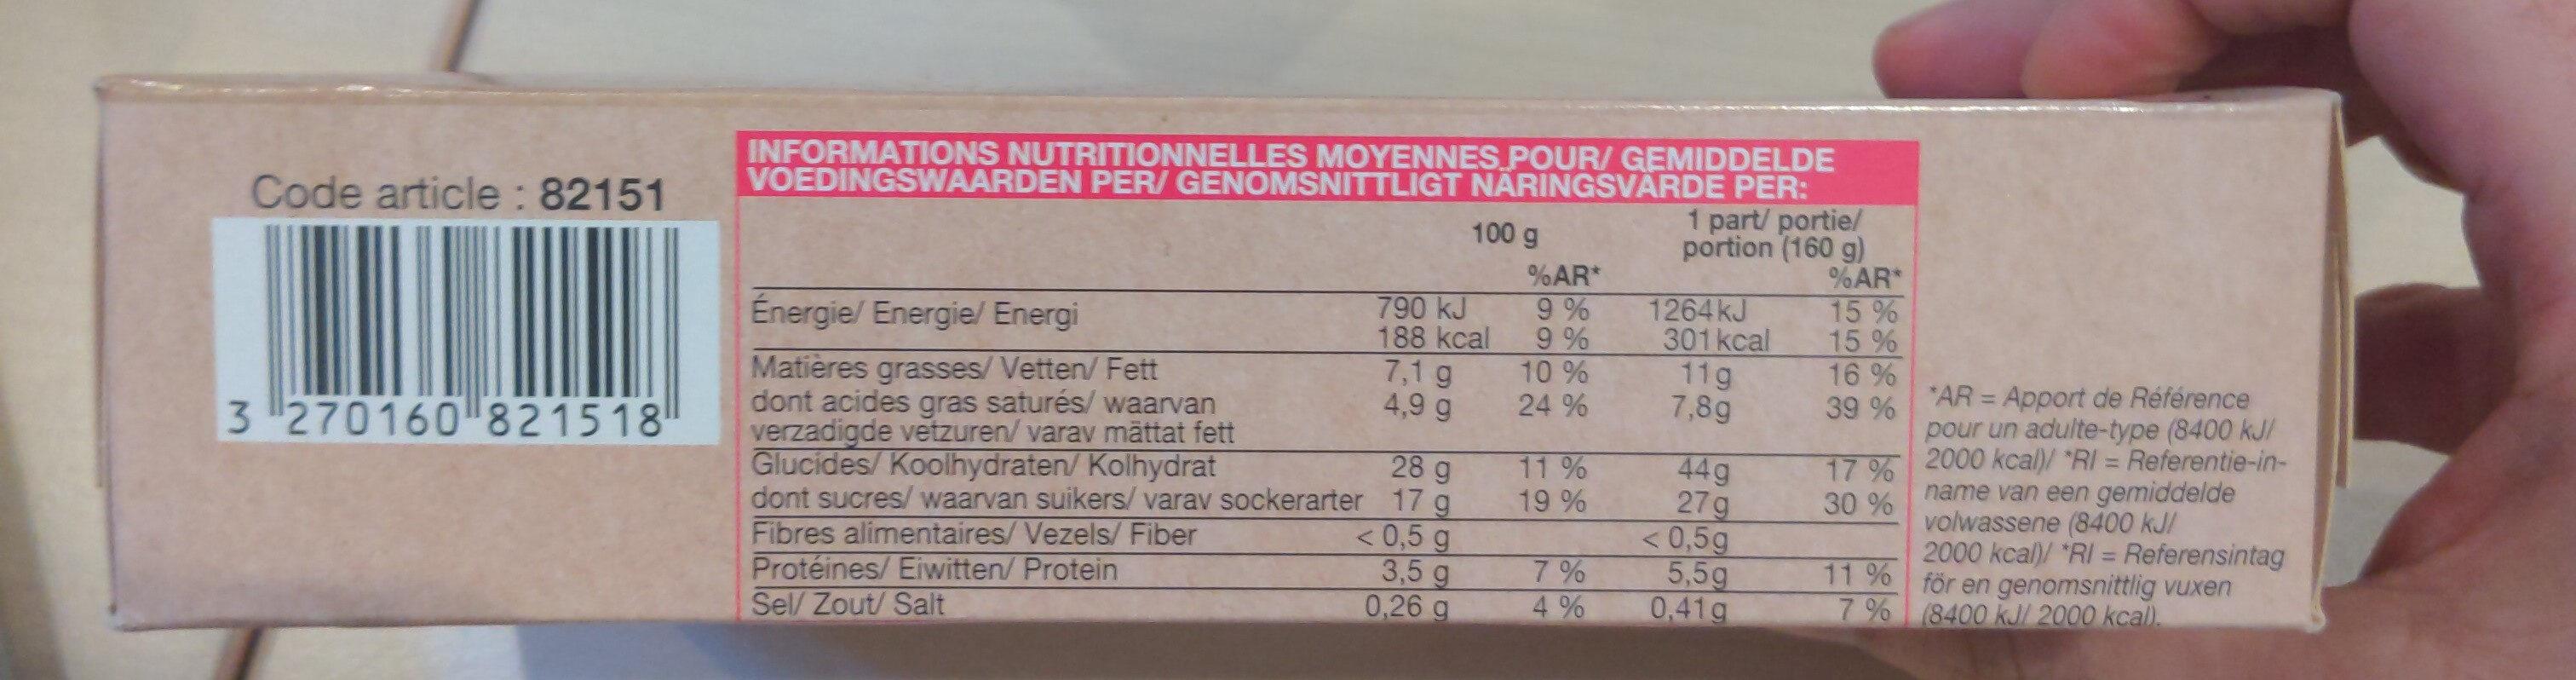 Flan Pâtissier Surgelé - Valori nutrizionali - fr